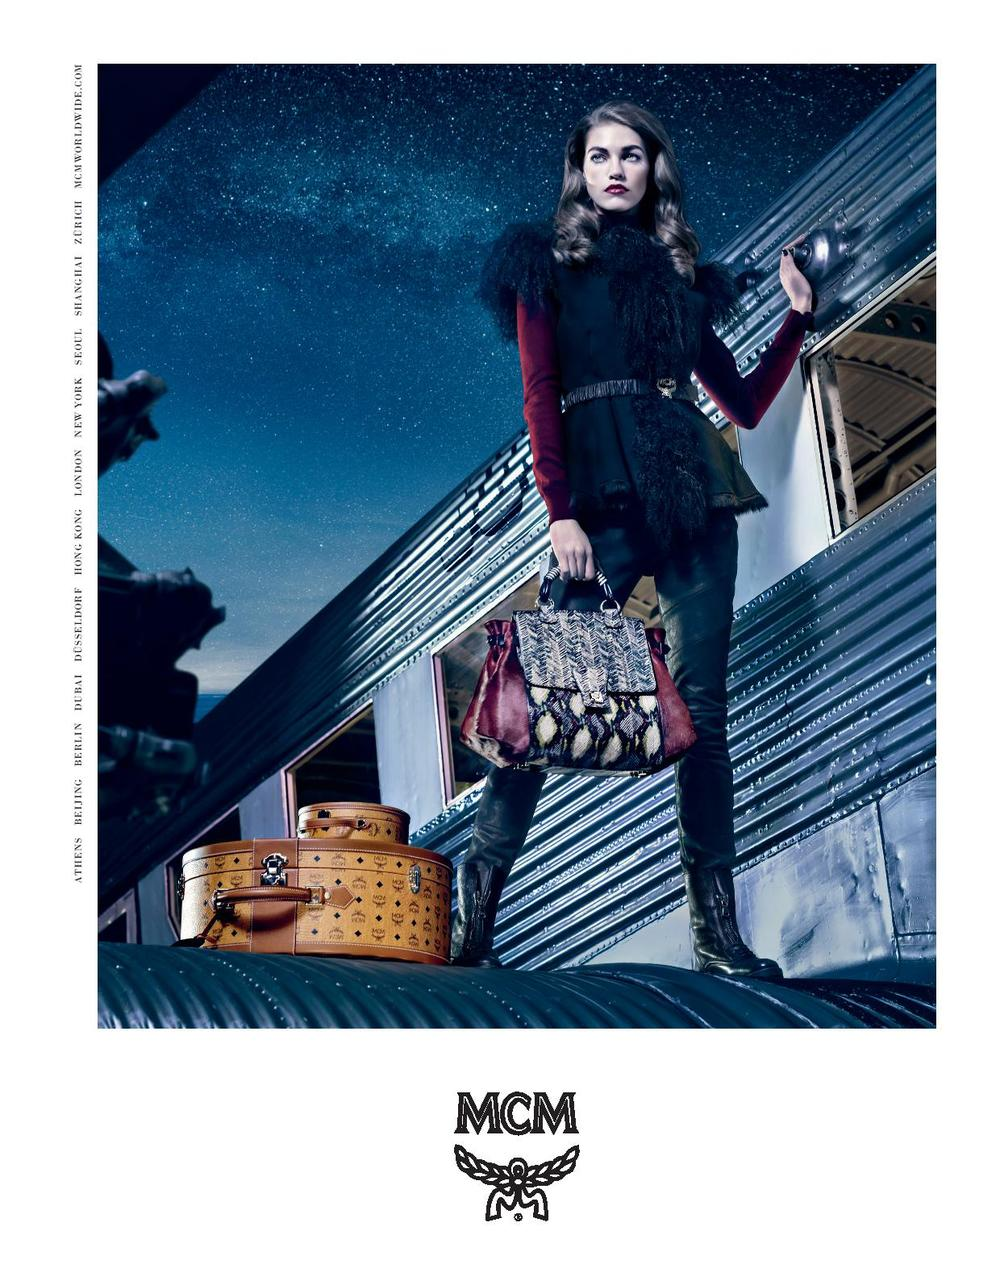 MCM FW13 Print Ads_210x270-page-002.jpg